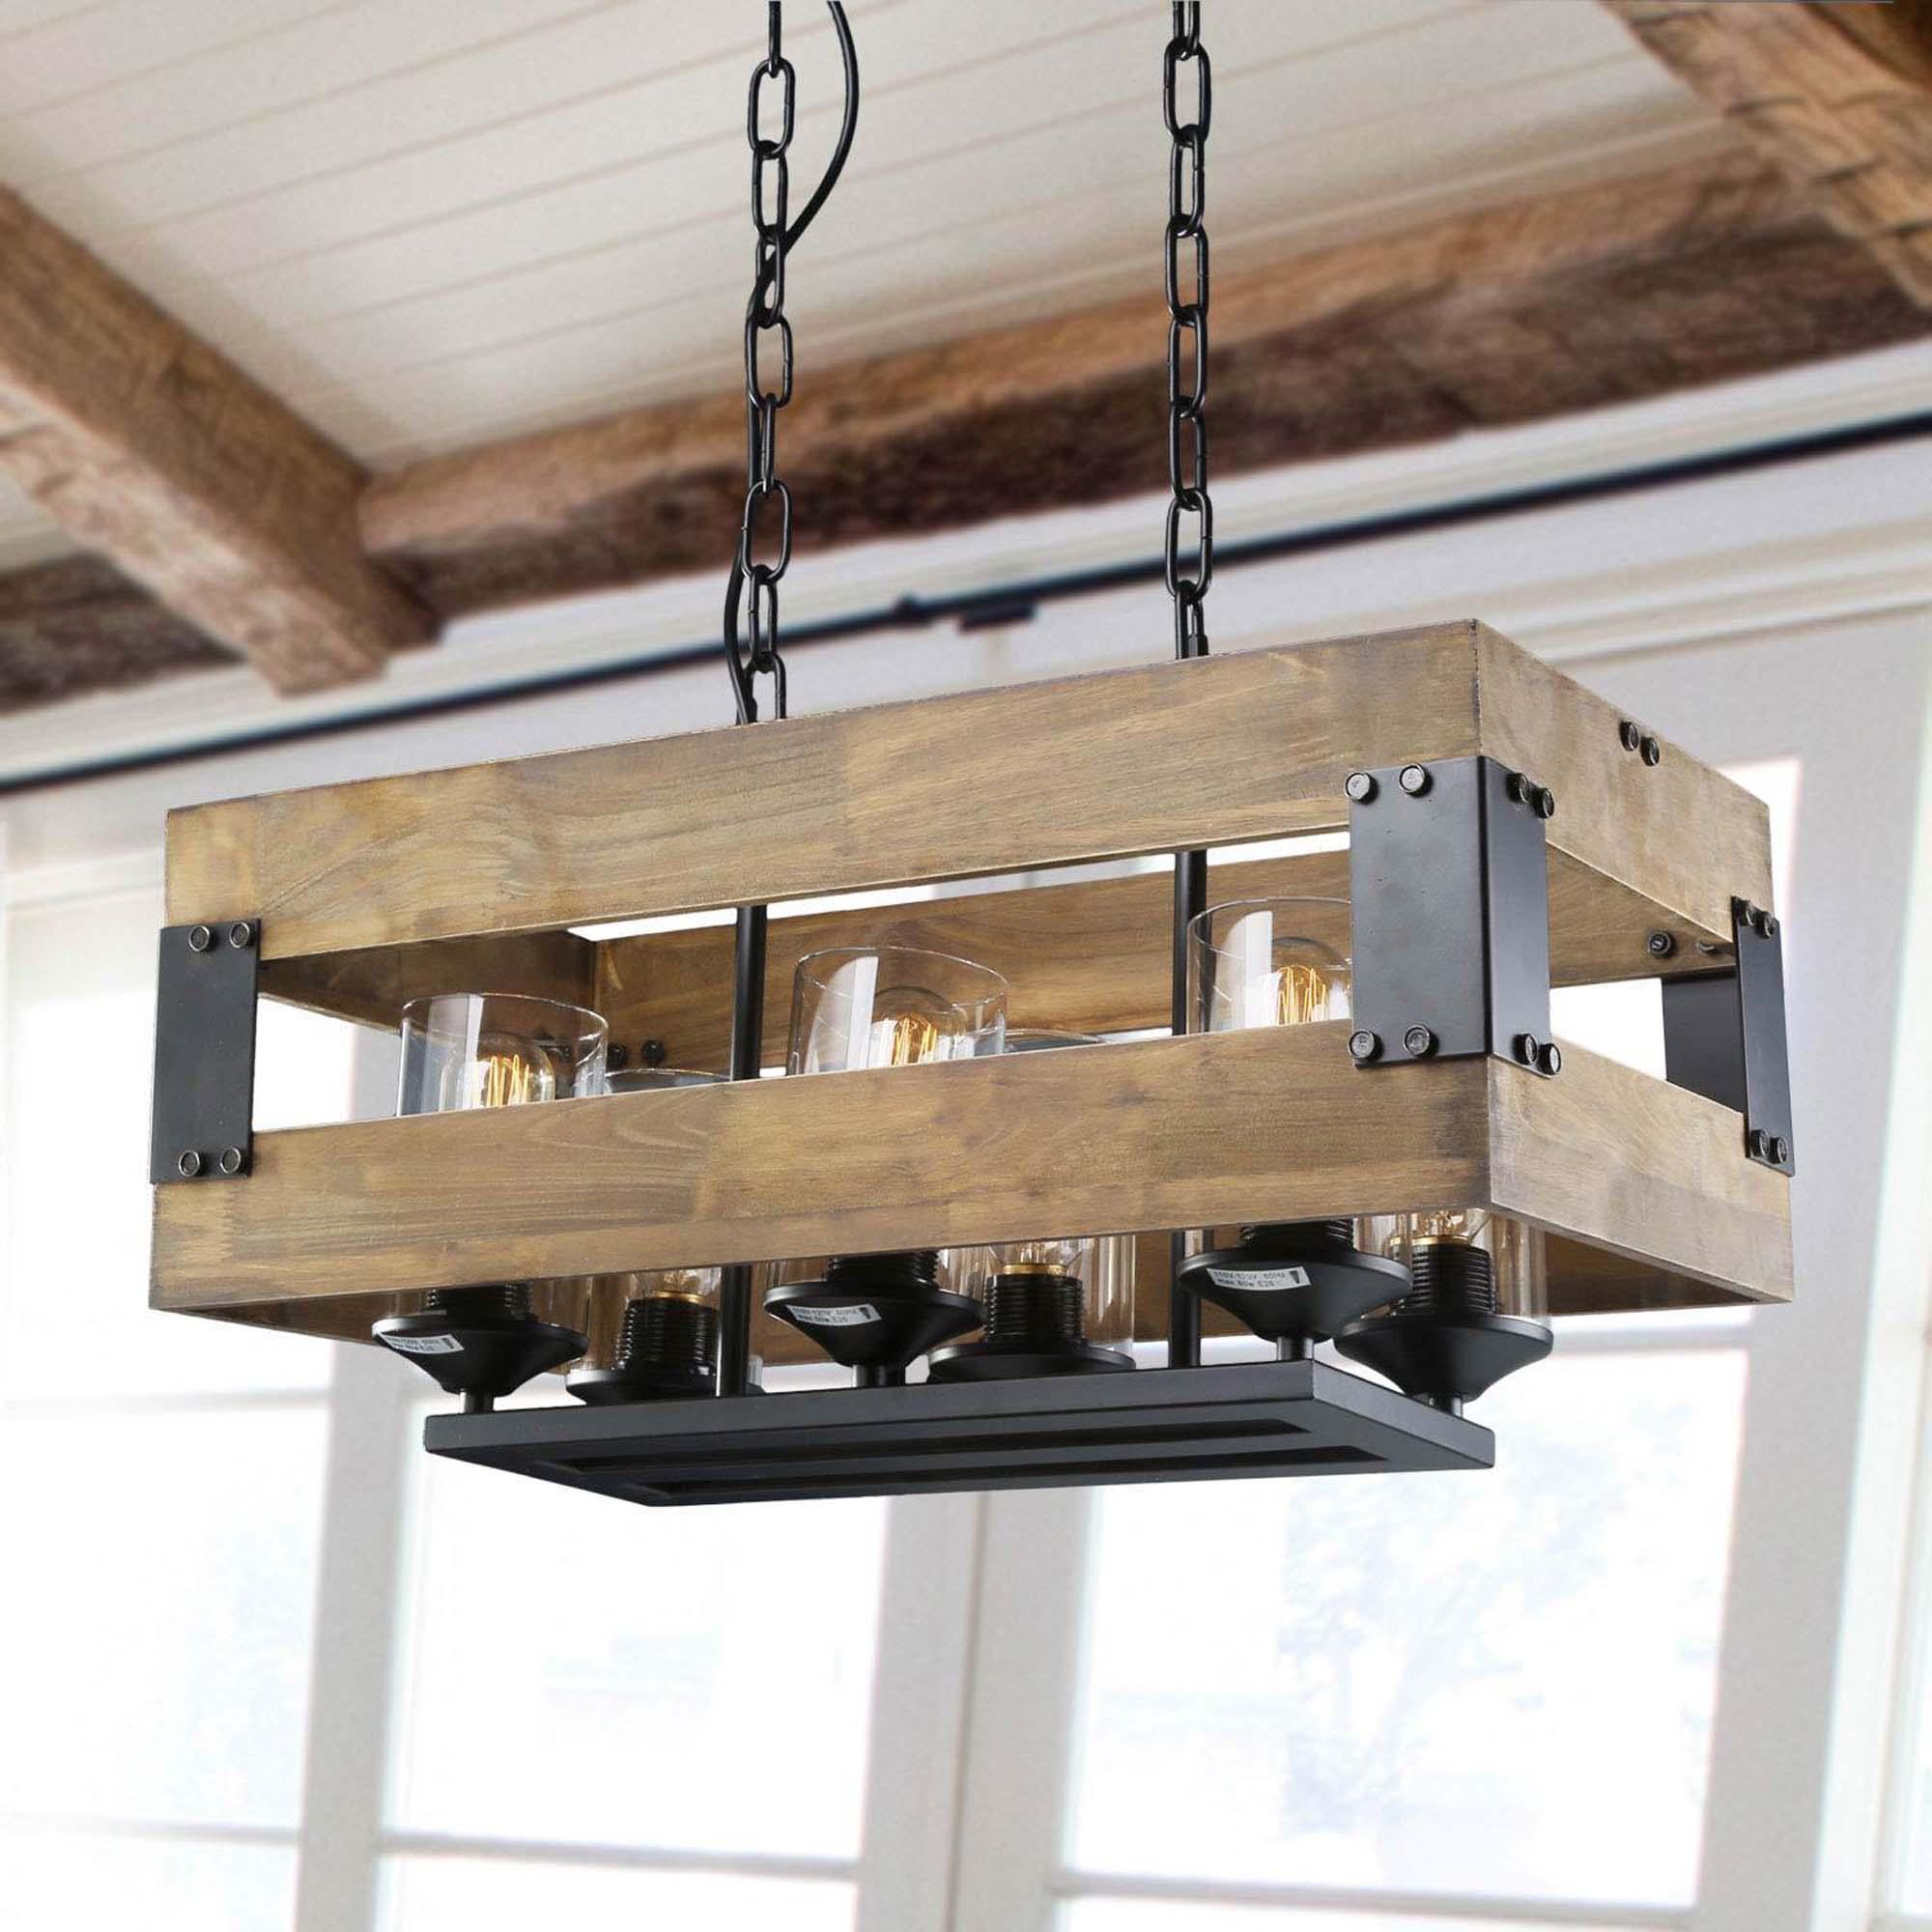 lnc farmhouse 6 light wood chandeliers rustic kitchen island lighting